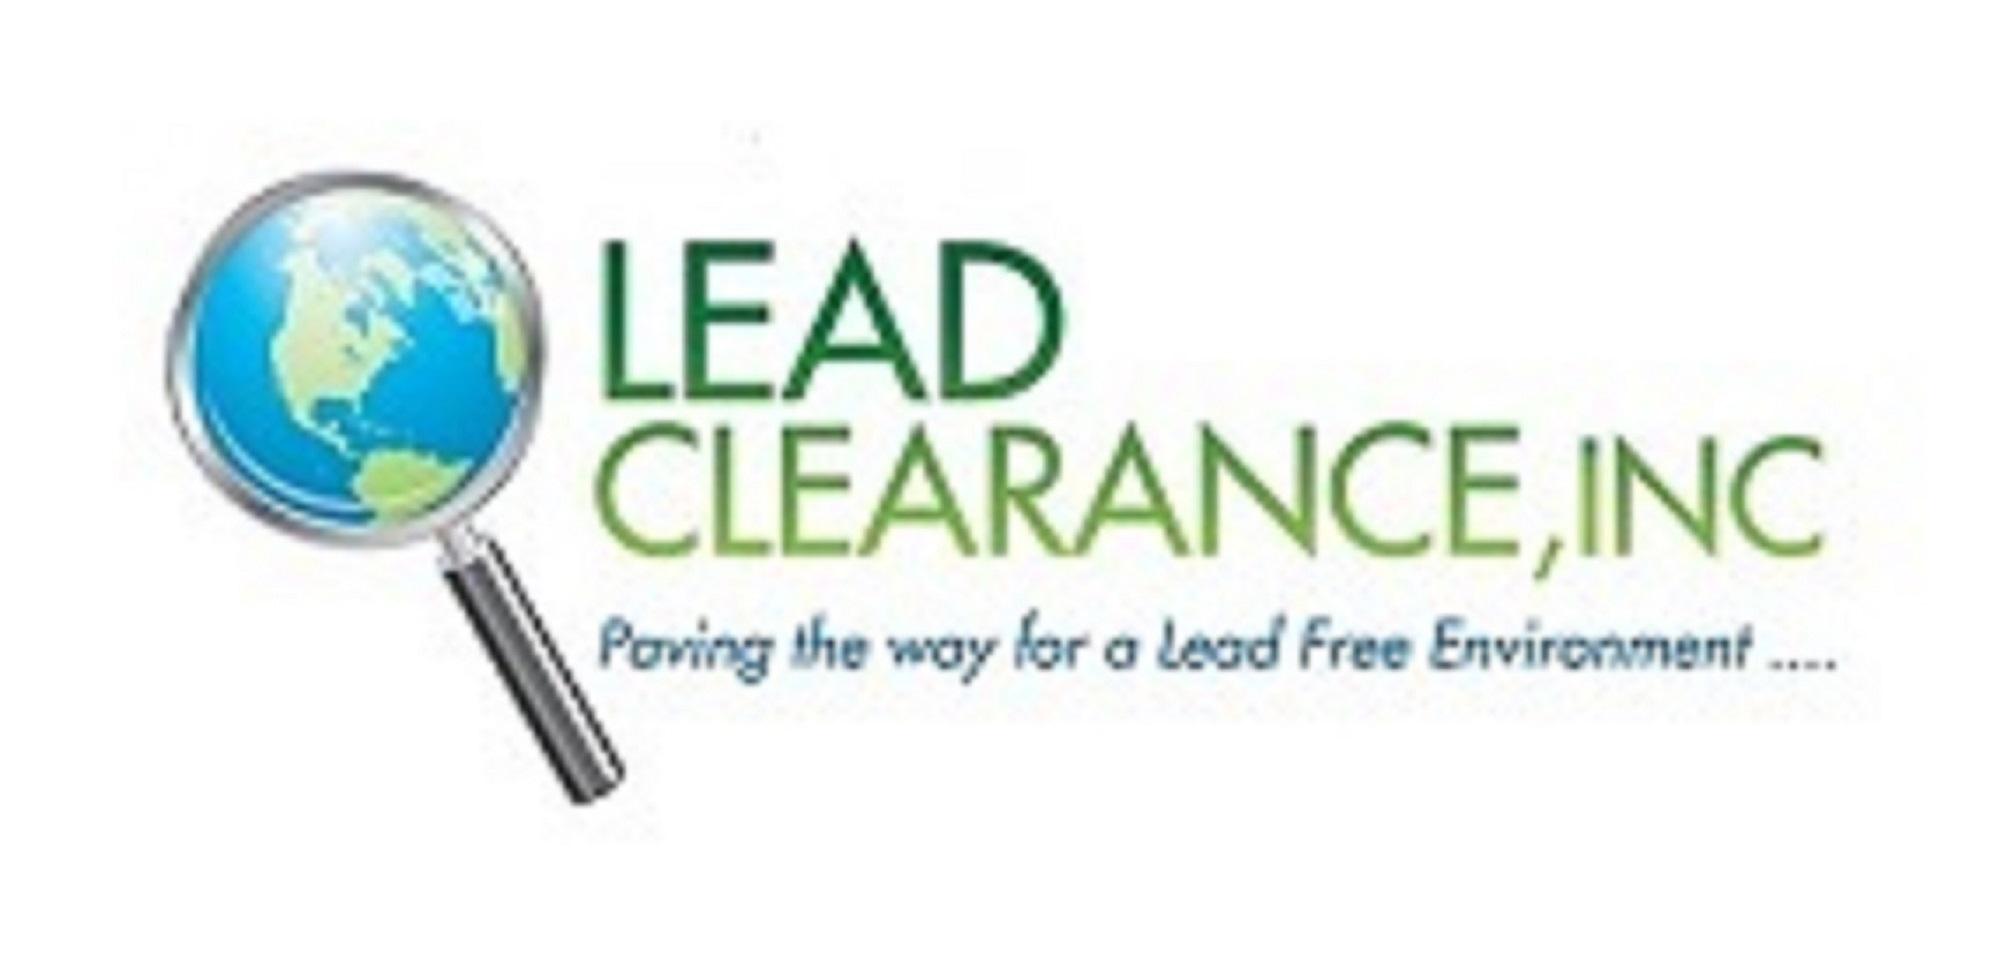 Lead Clearance Inc.